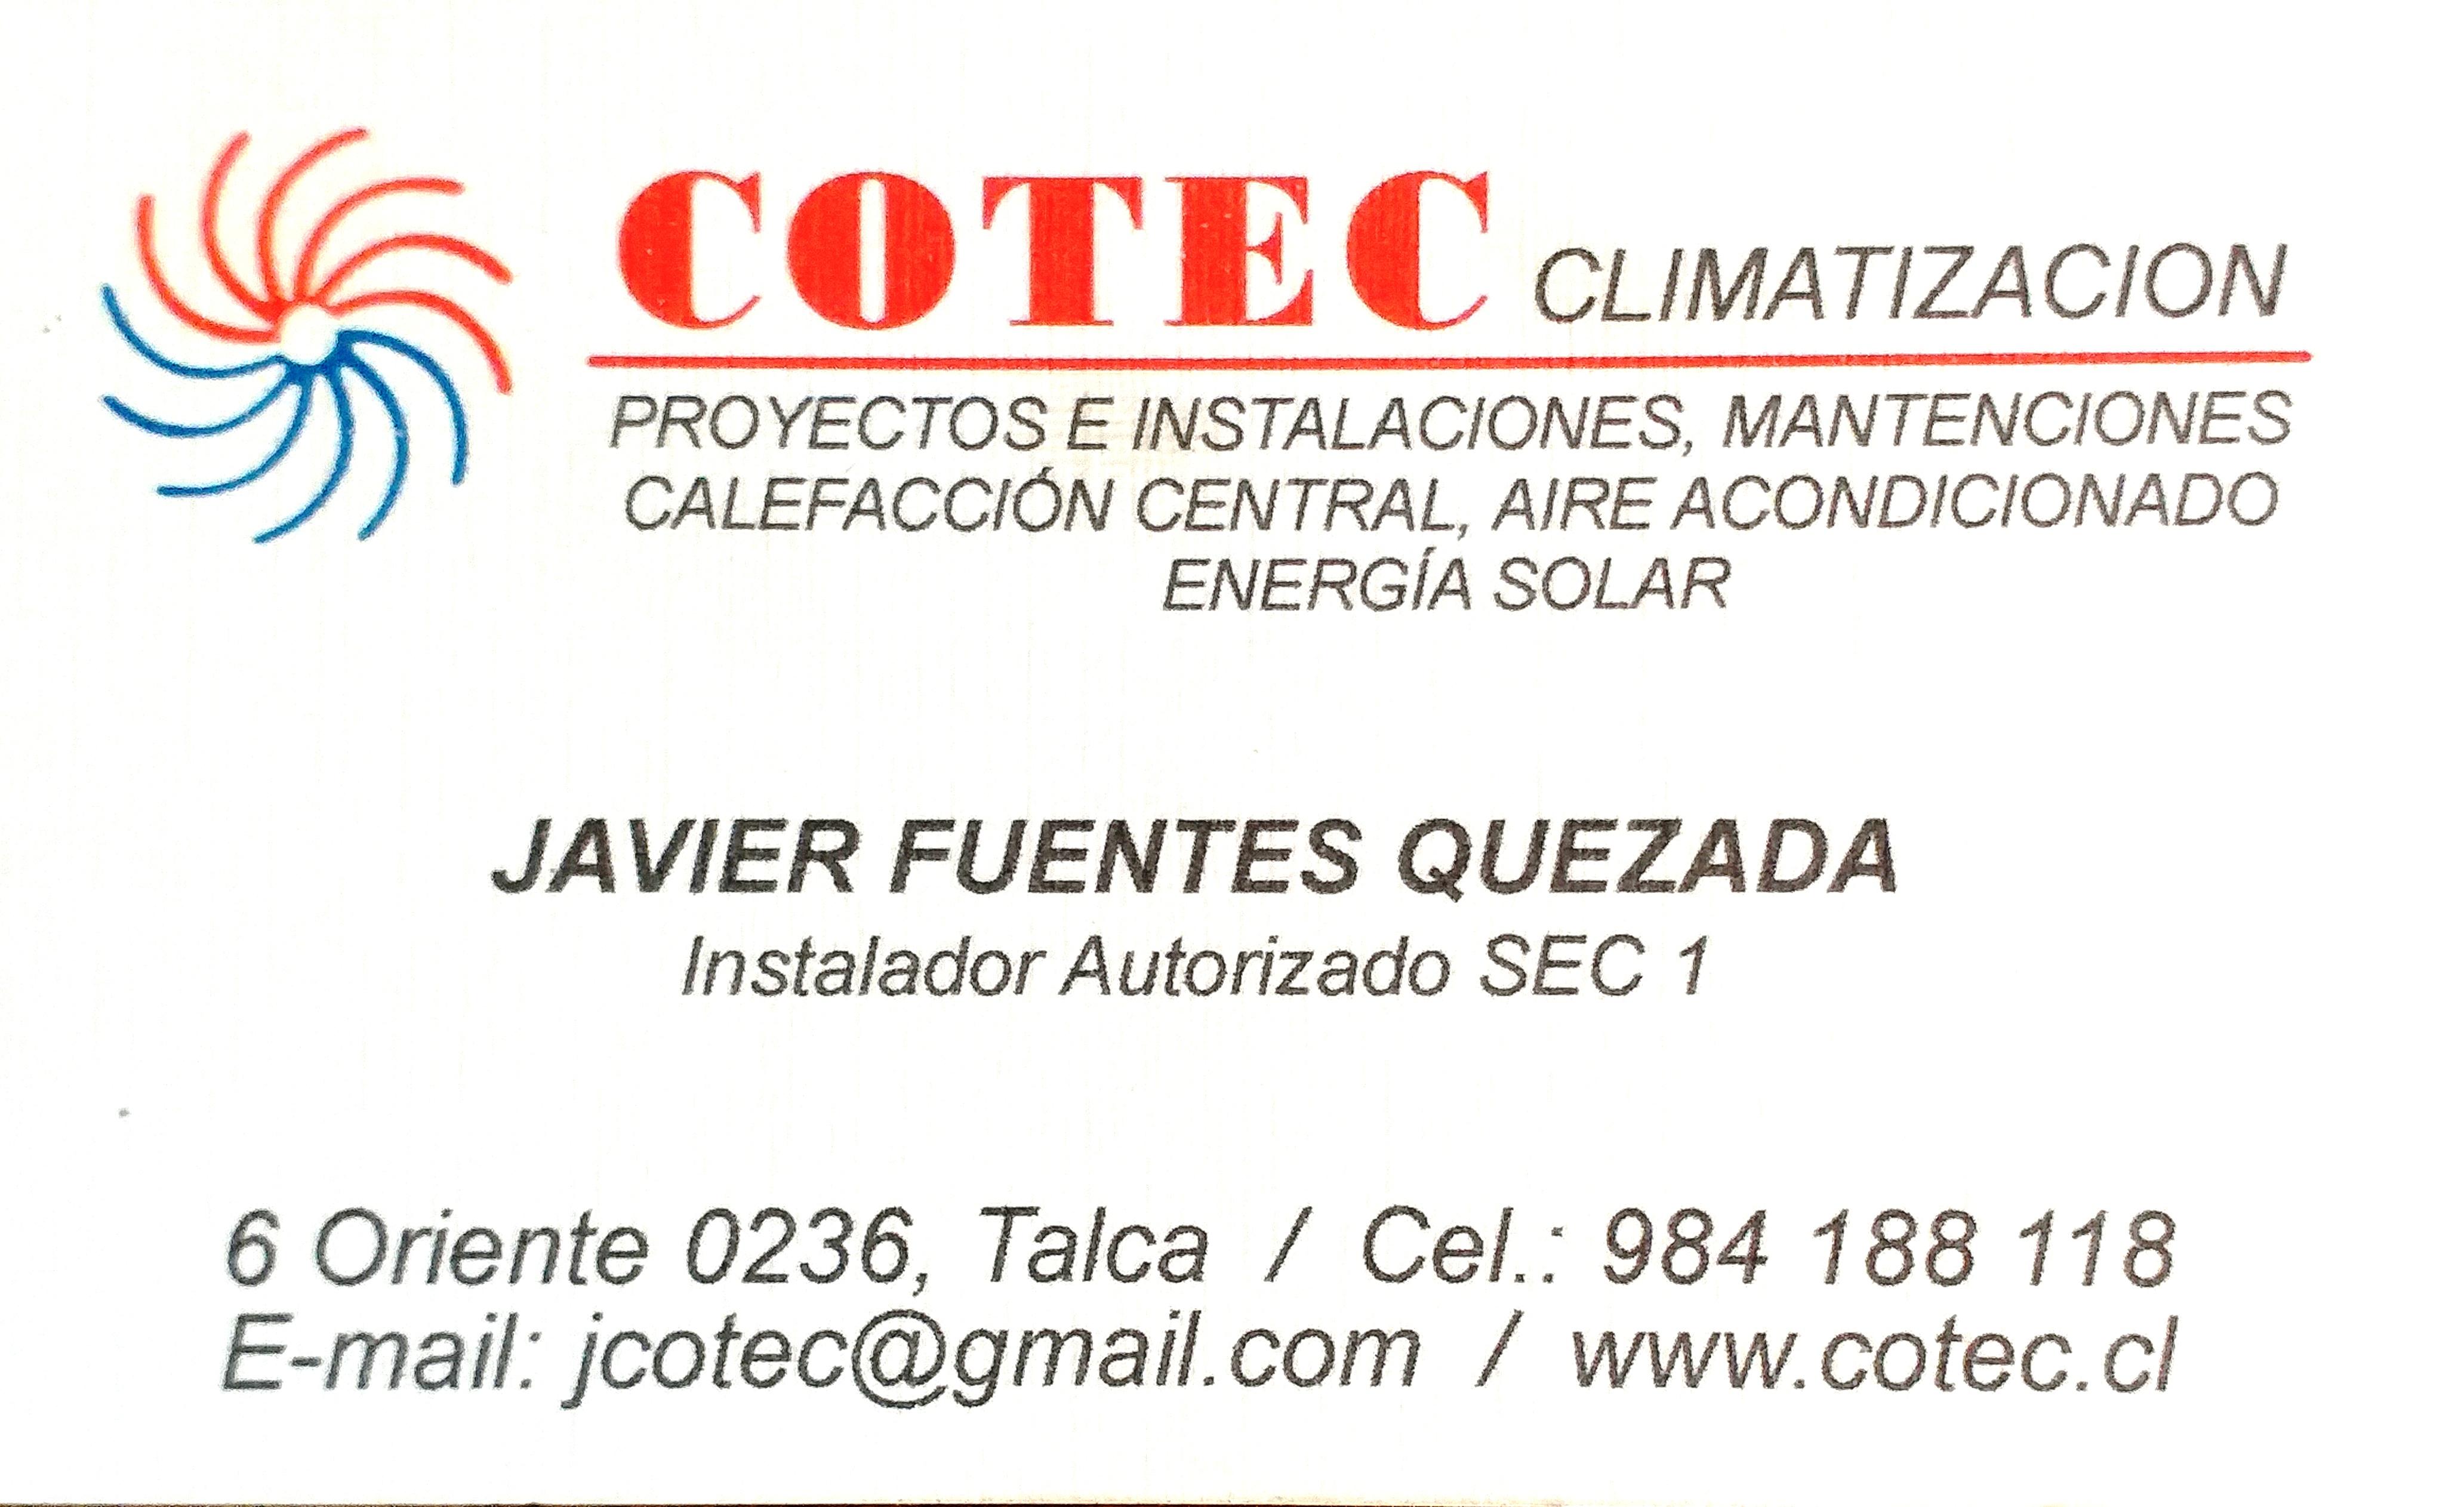 Cotec Climatizacion